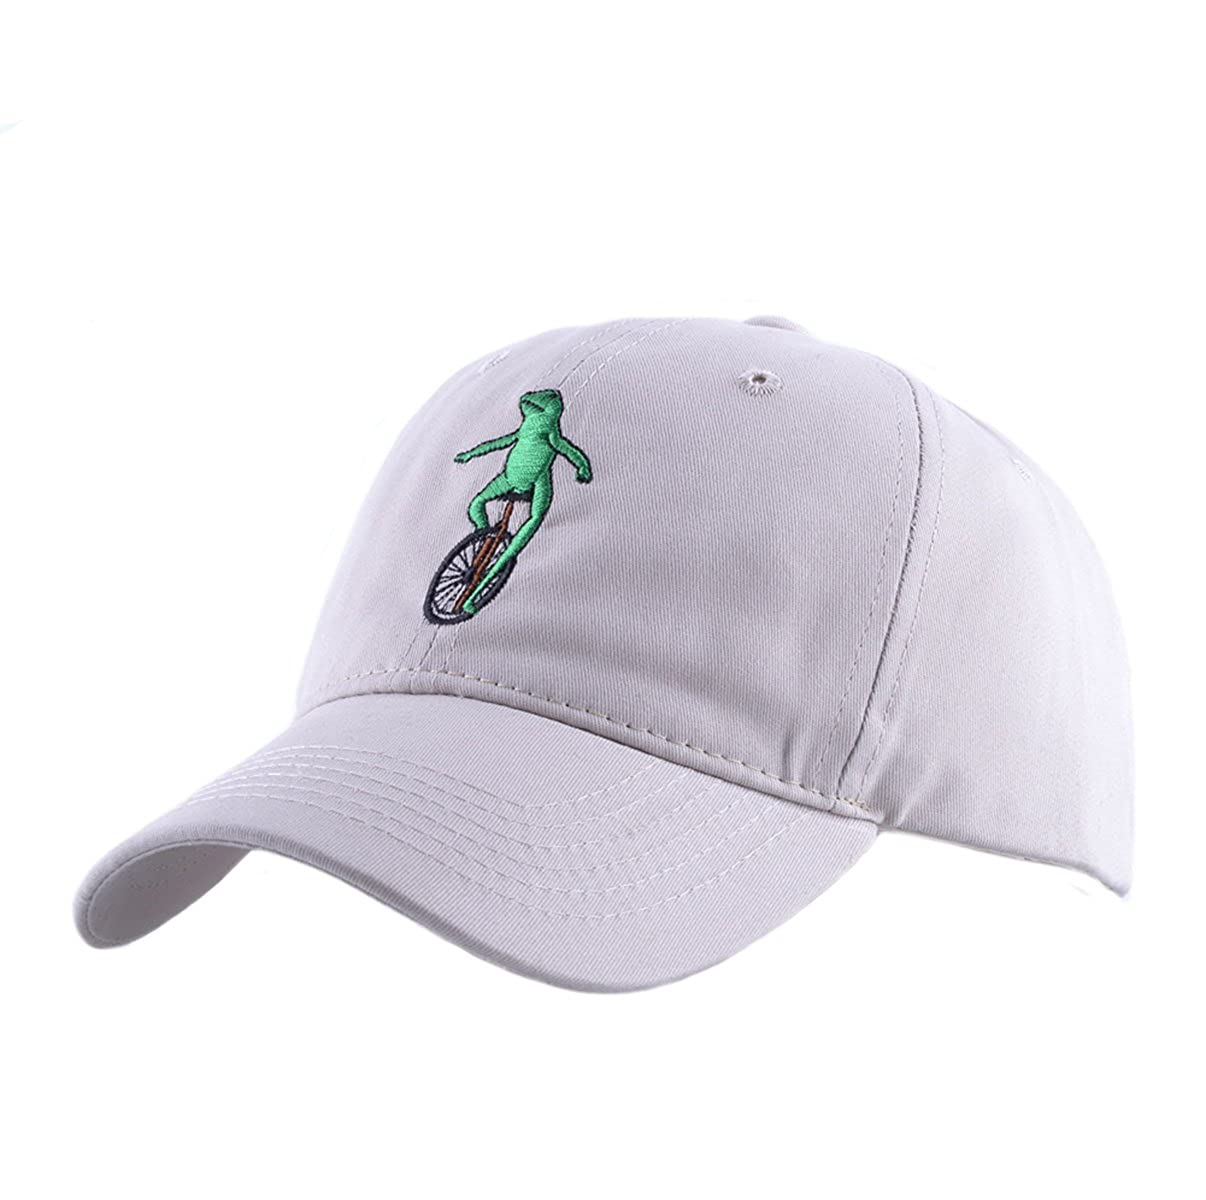 d32f84bd277 Himozoo Women Men Baseball Cap 100% Cotton Washed wheelbarrow Frog Embroidery  Dad Hat (Beige)  Amazon.co.uk  Clothing